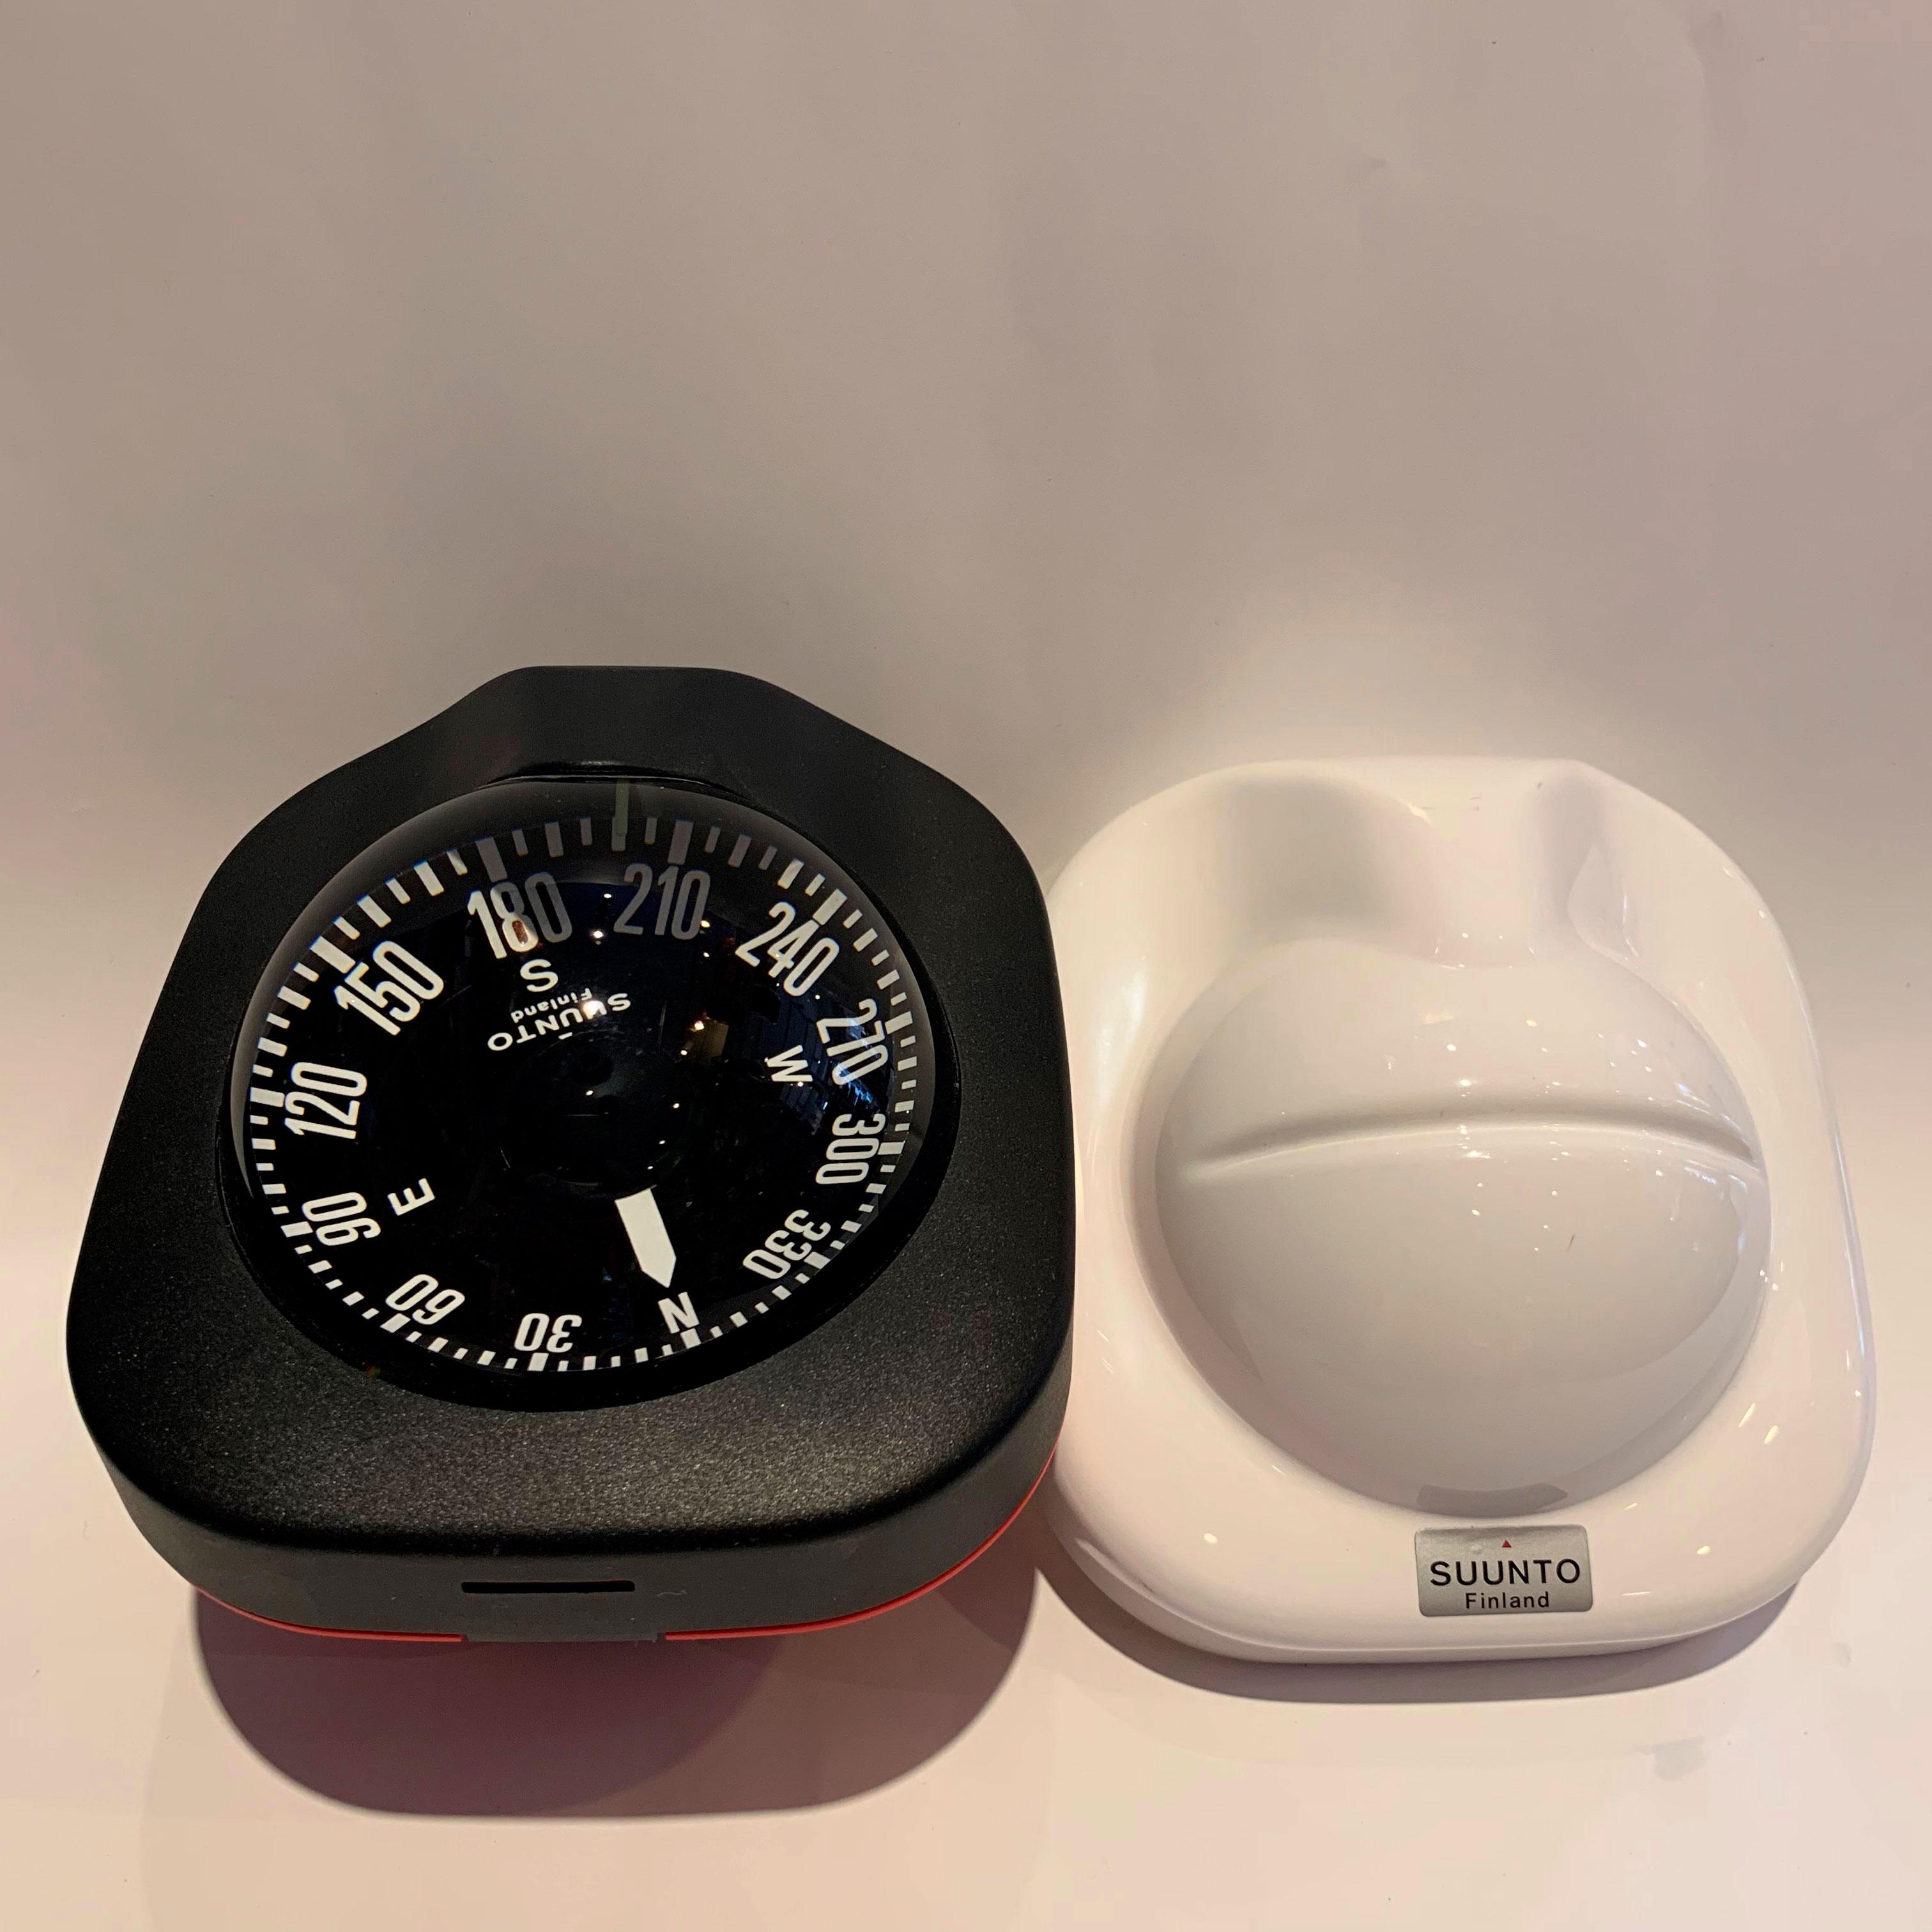 Suunto kompas til piedestal 120x125mm